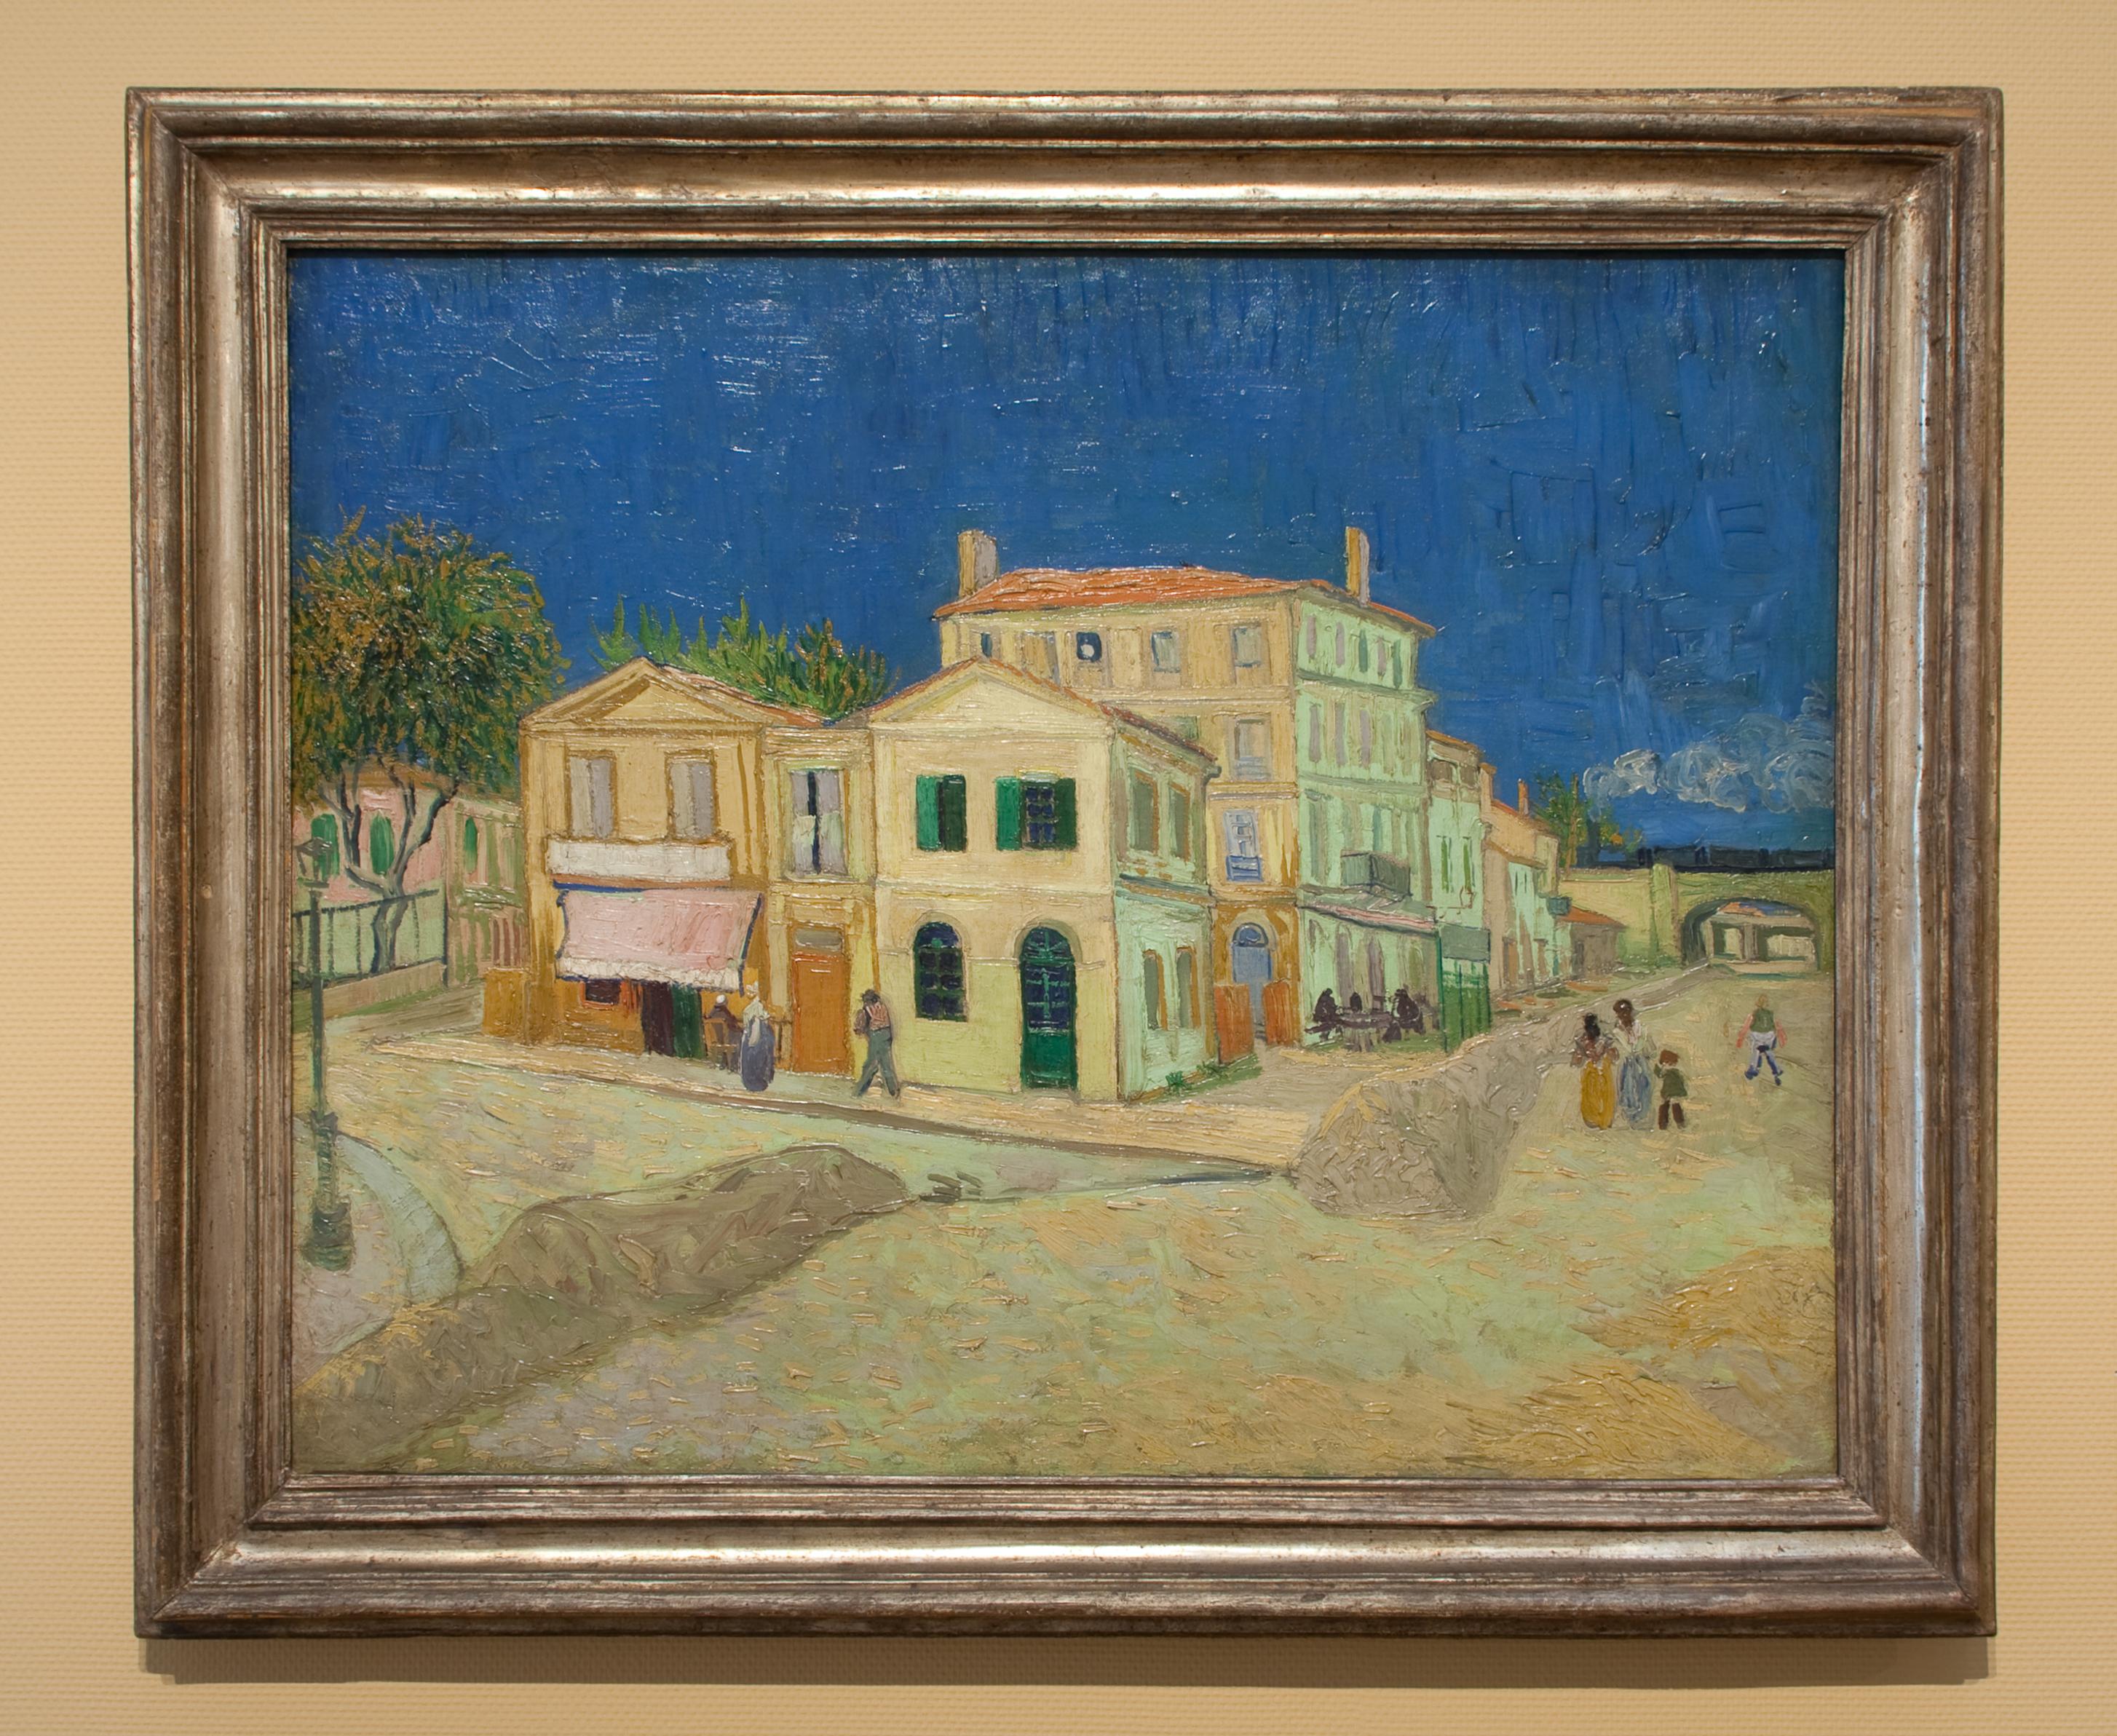 Maison Jaune Van Gogh